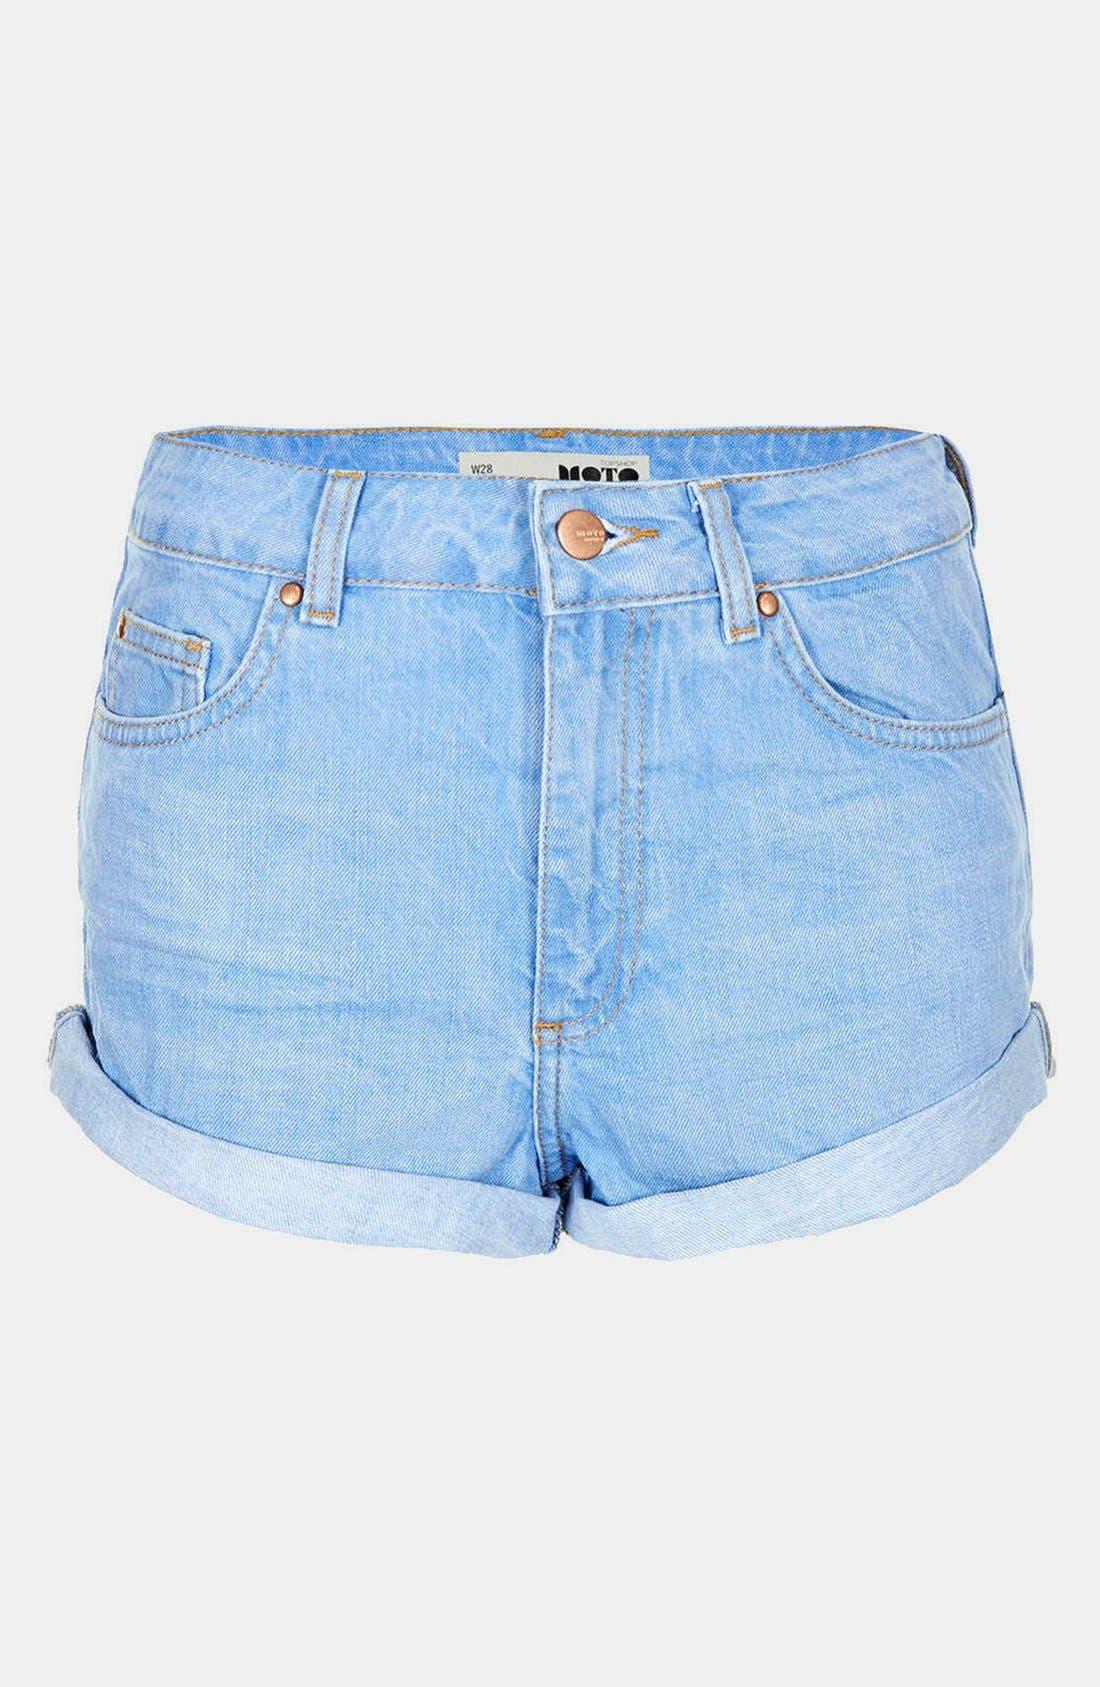 Alternate Image 3  - Topshop Moto 'Polly' Denim Shorts